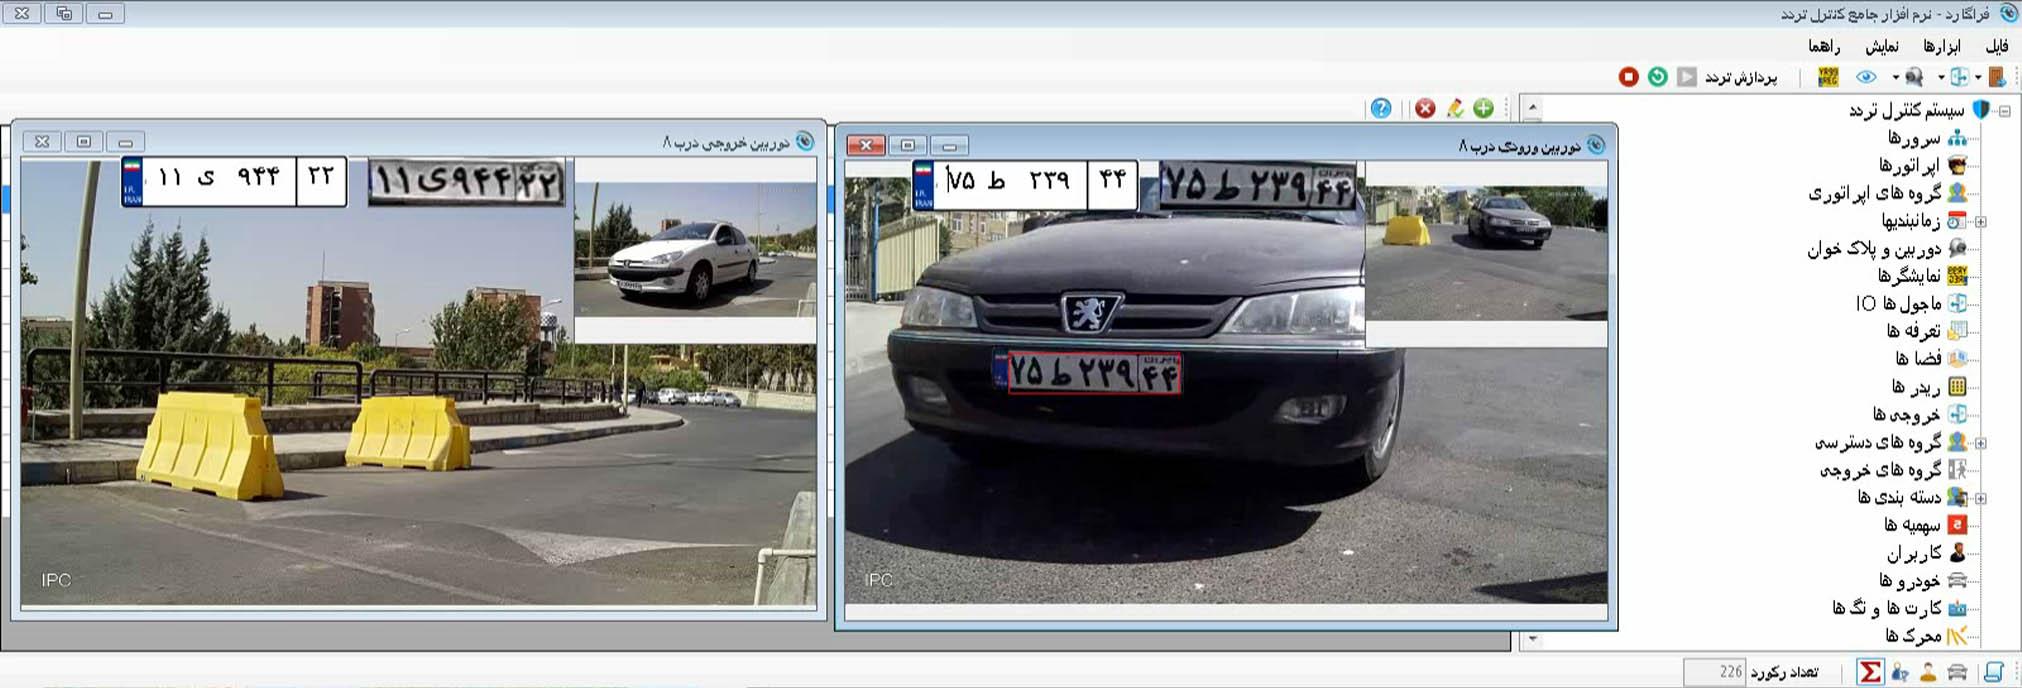 سامانه تشخیص پلاک خودرو